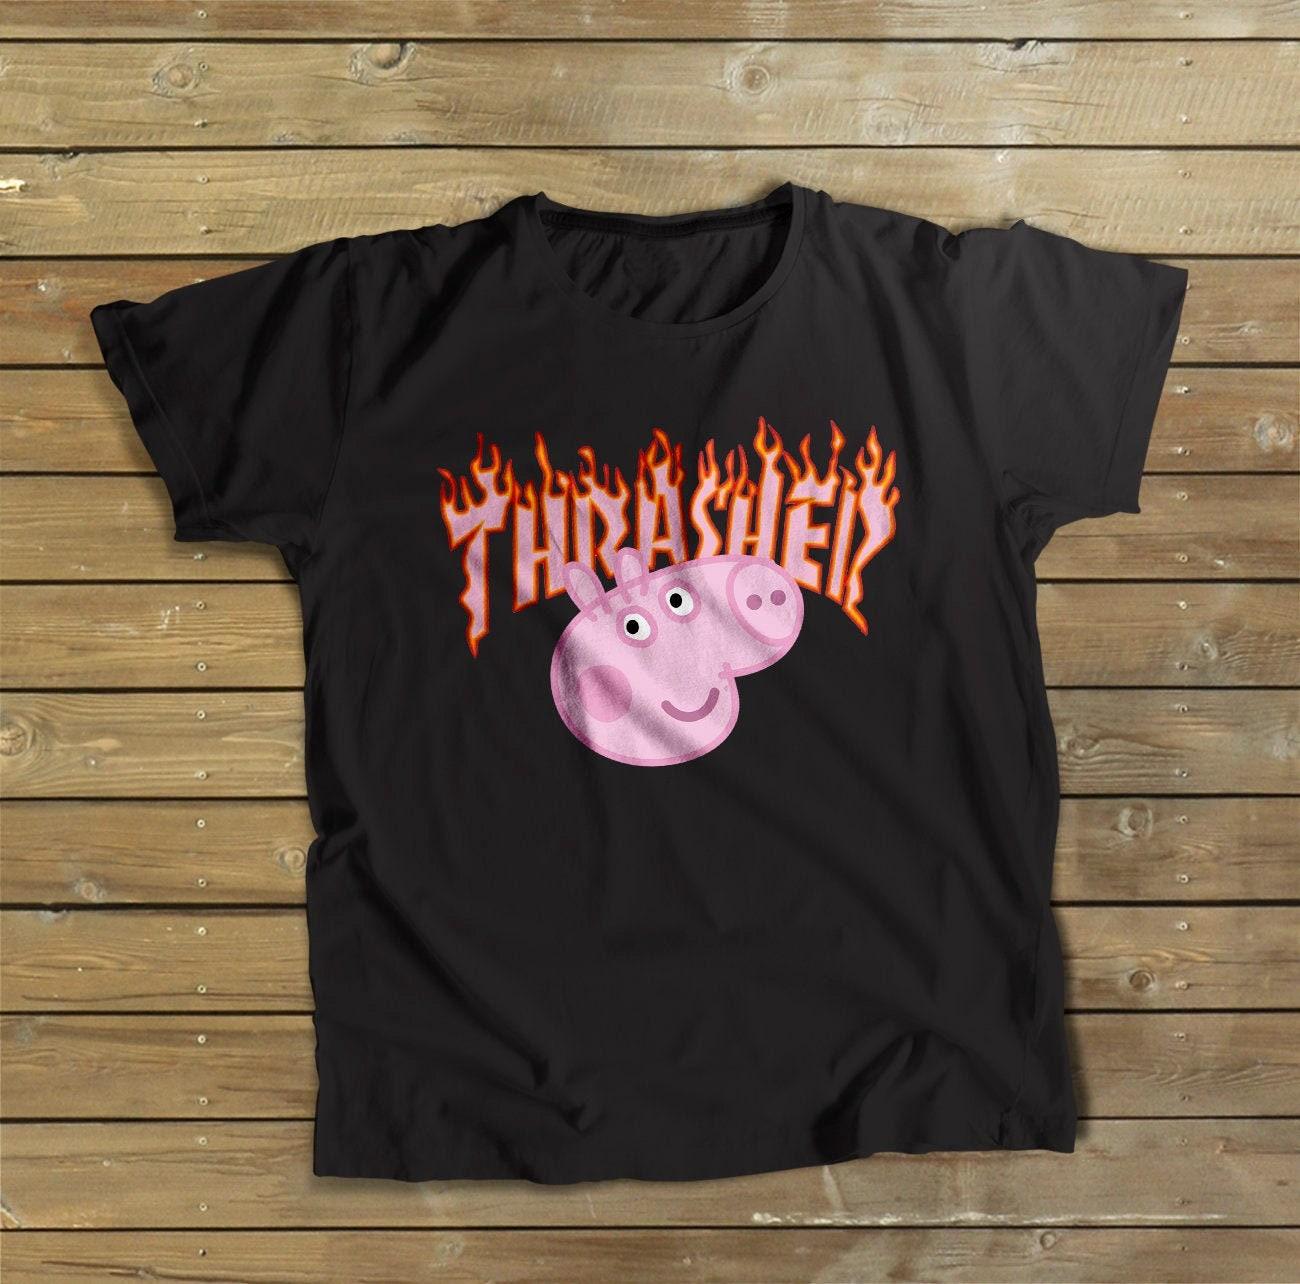 Thrasher Peppa Pig Shirt Gucci Shirt Peppa Pig Shirt Gucci Tshirt Gucci Gift Hypebeast Shirt Birthday Gift Men S Women S Gucci Shirt